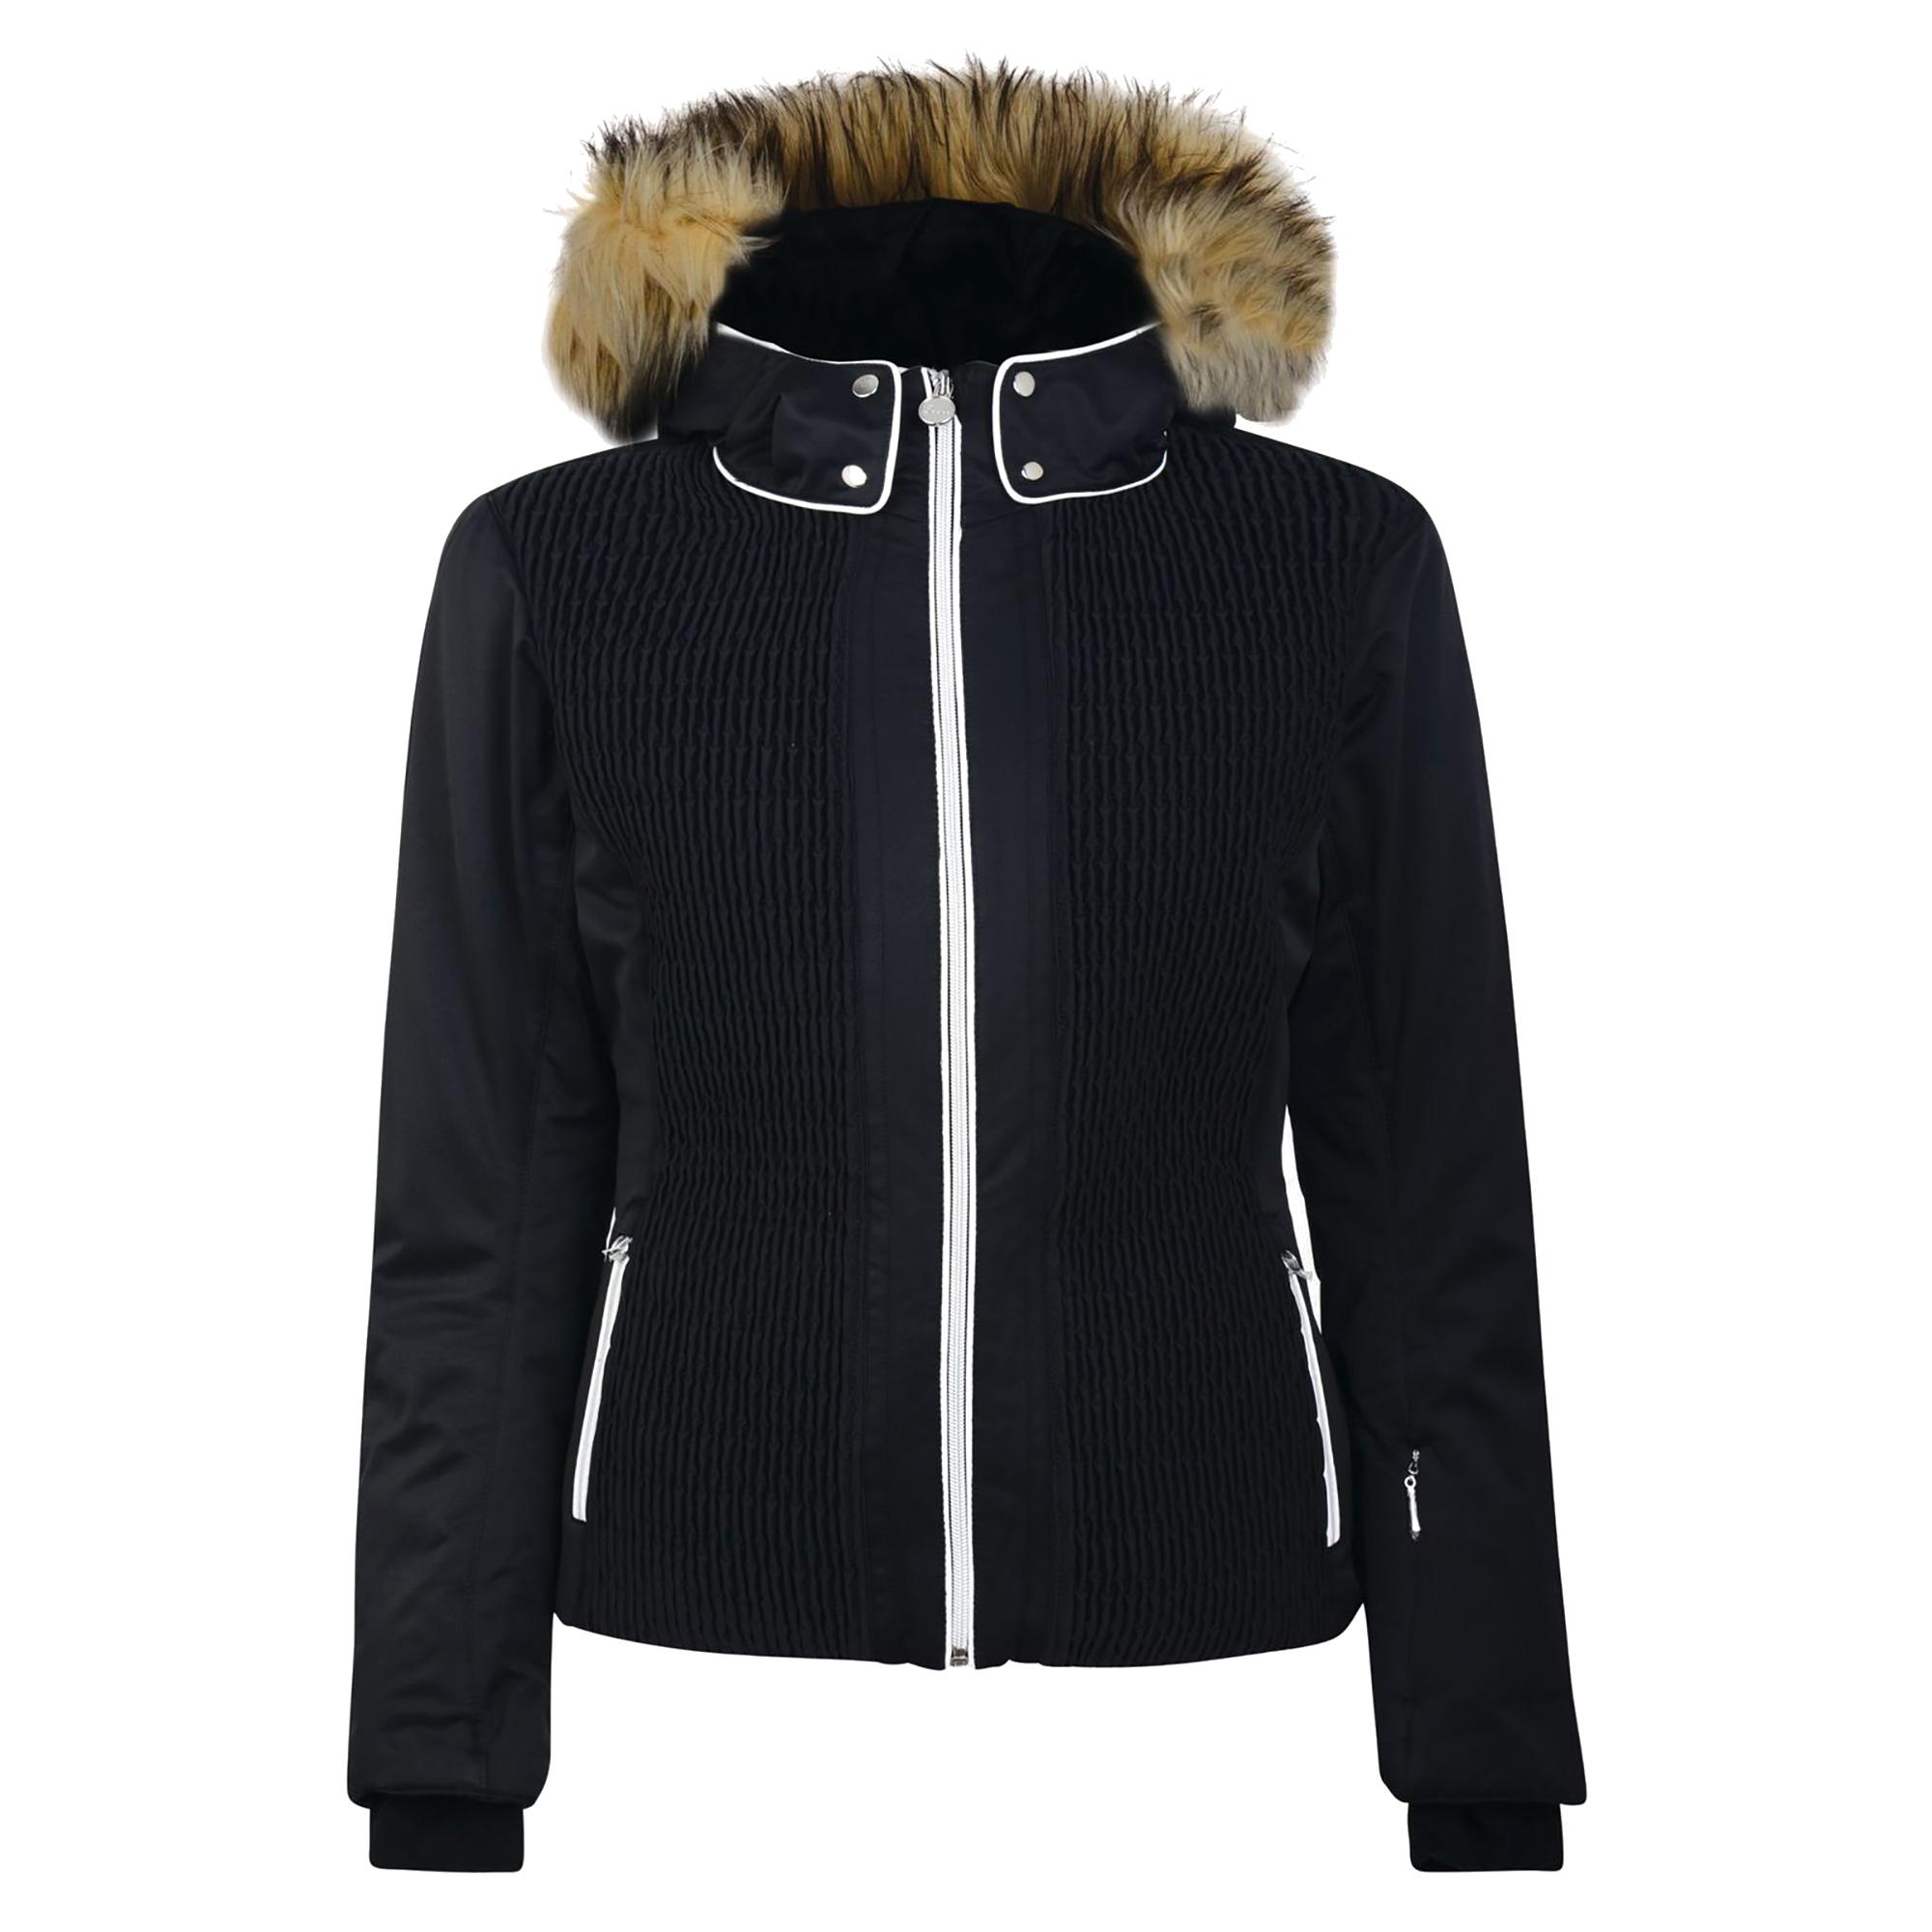 Dare2B Womens/Ladies Statement Jacket (UK Size 12) (Jet Black)